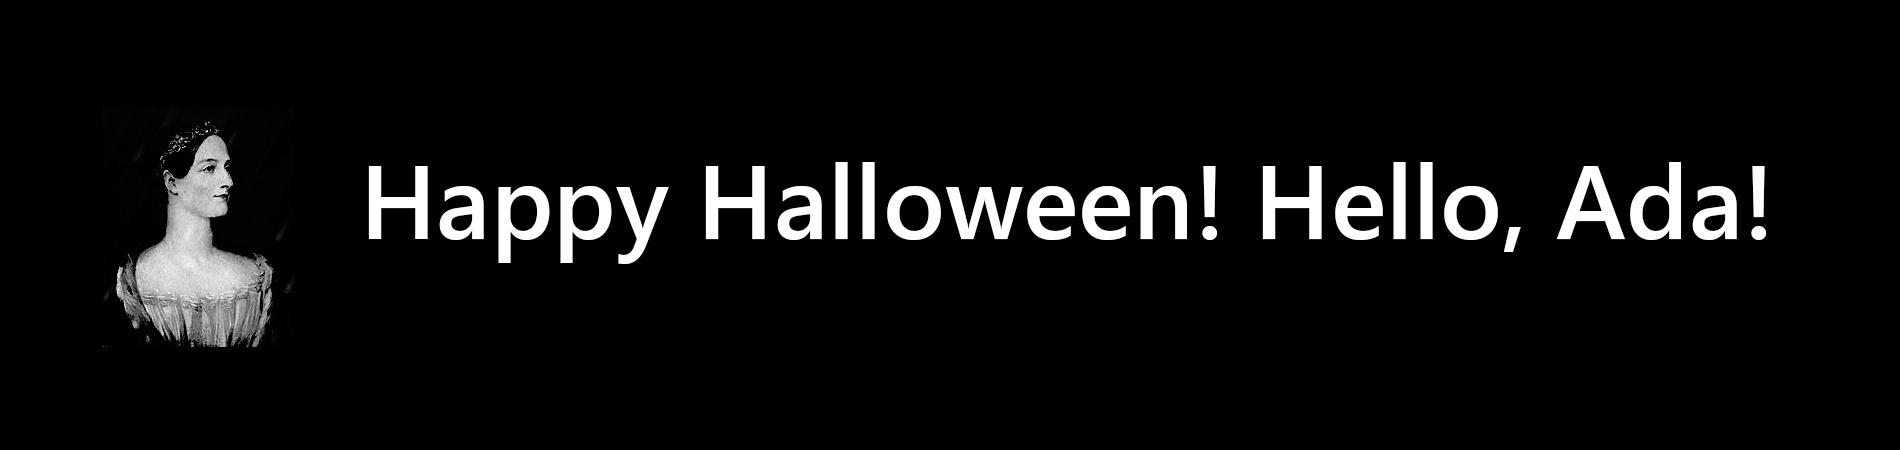 Happy Halloween! Hello, Ada